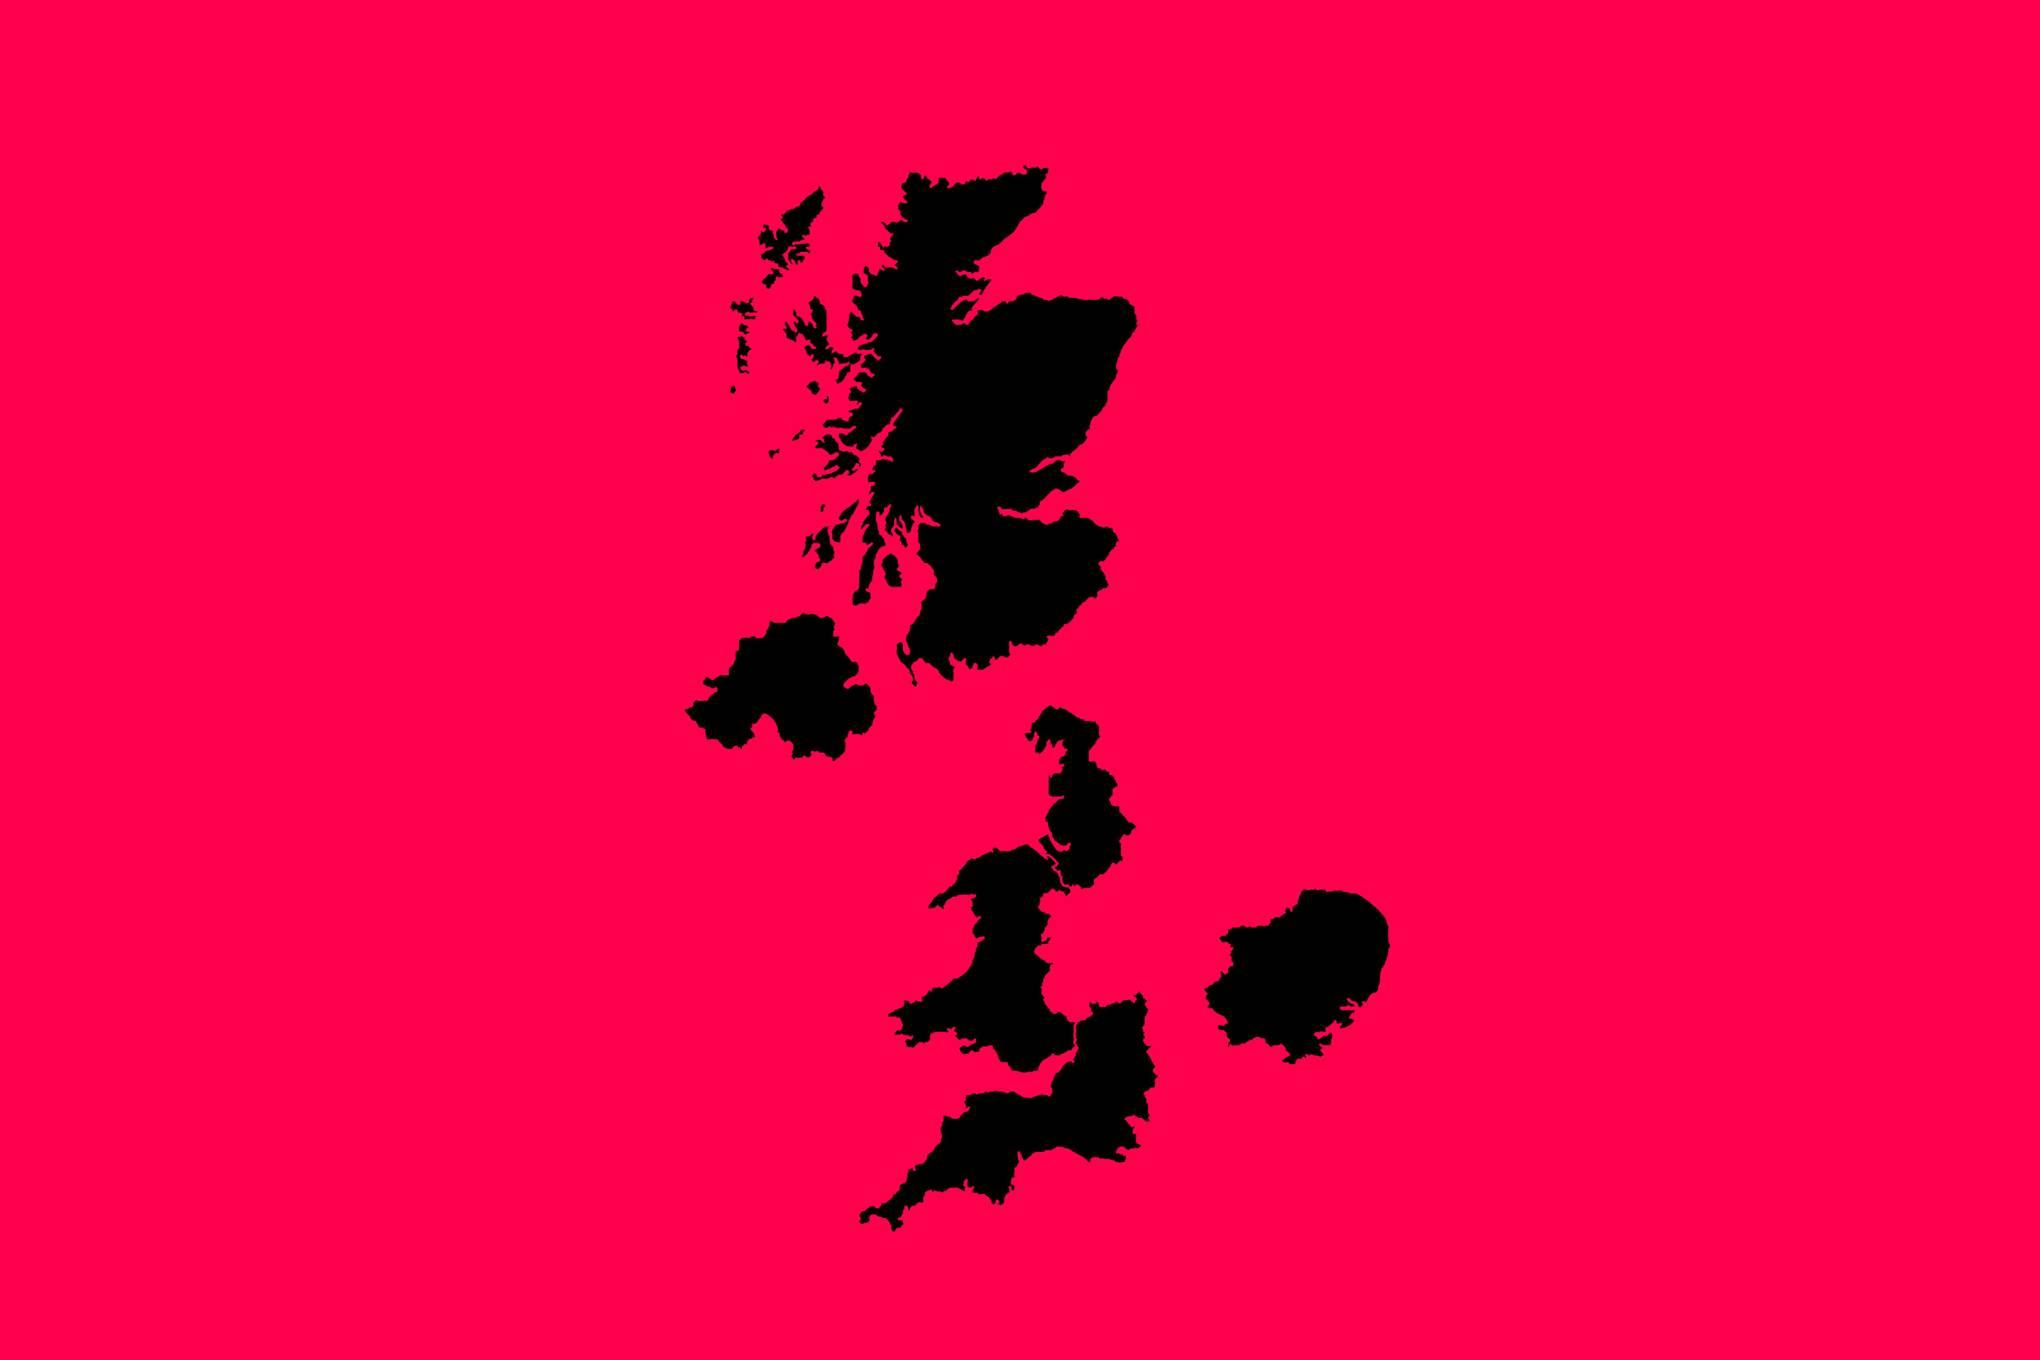 Don't believe the headlines saying half the UK has had coronavirus | WIRED  UK